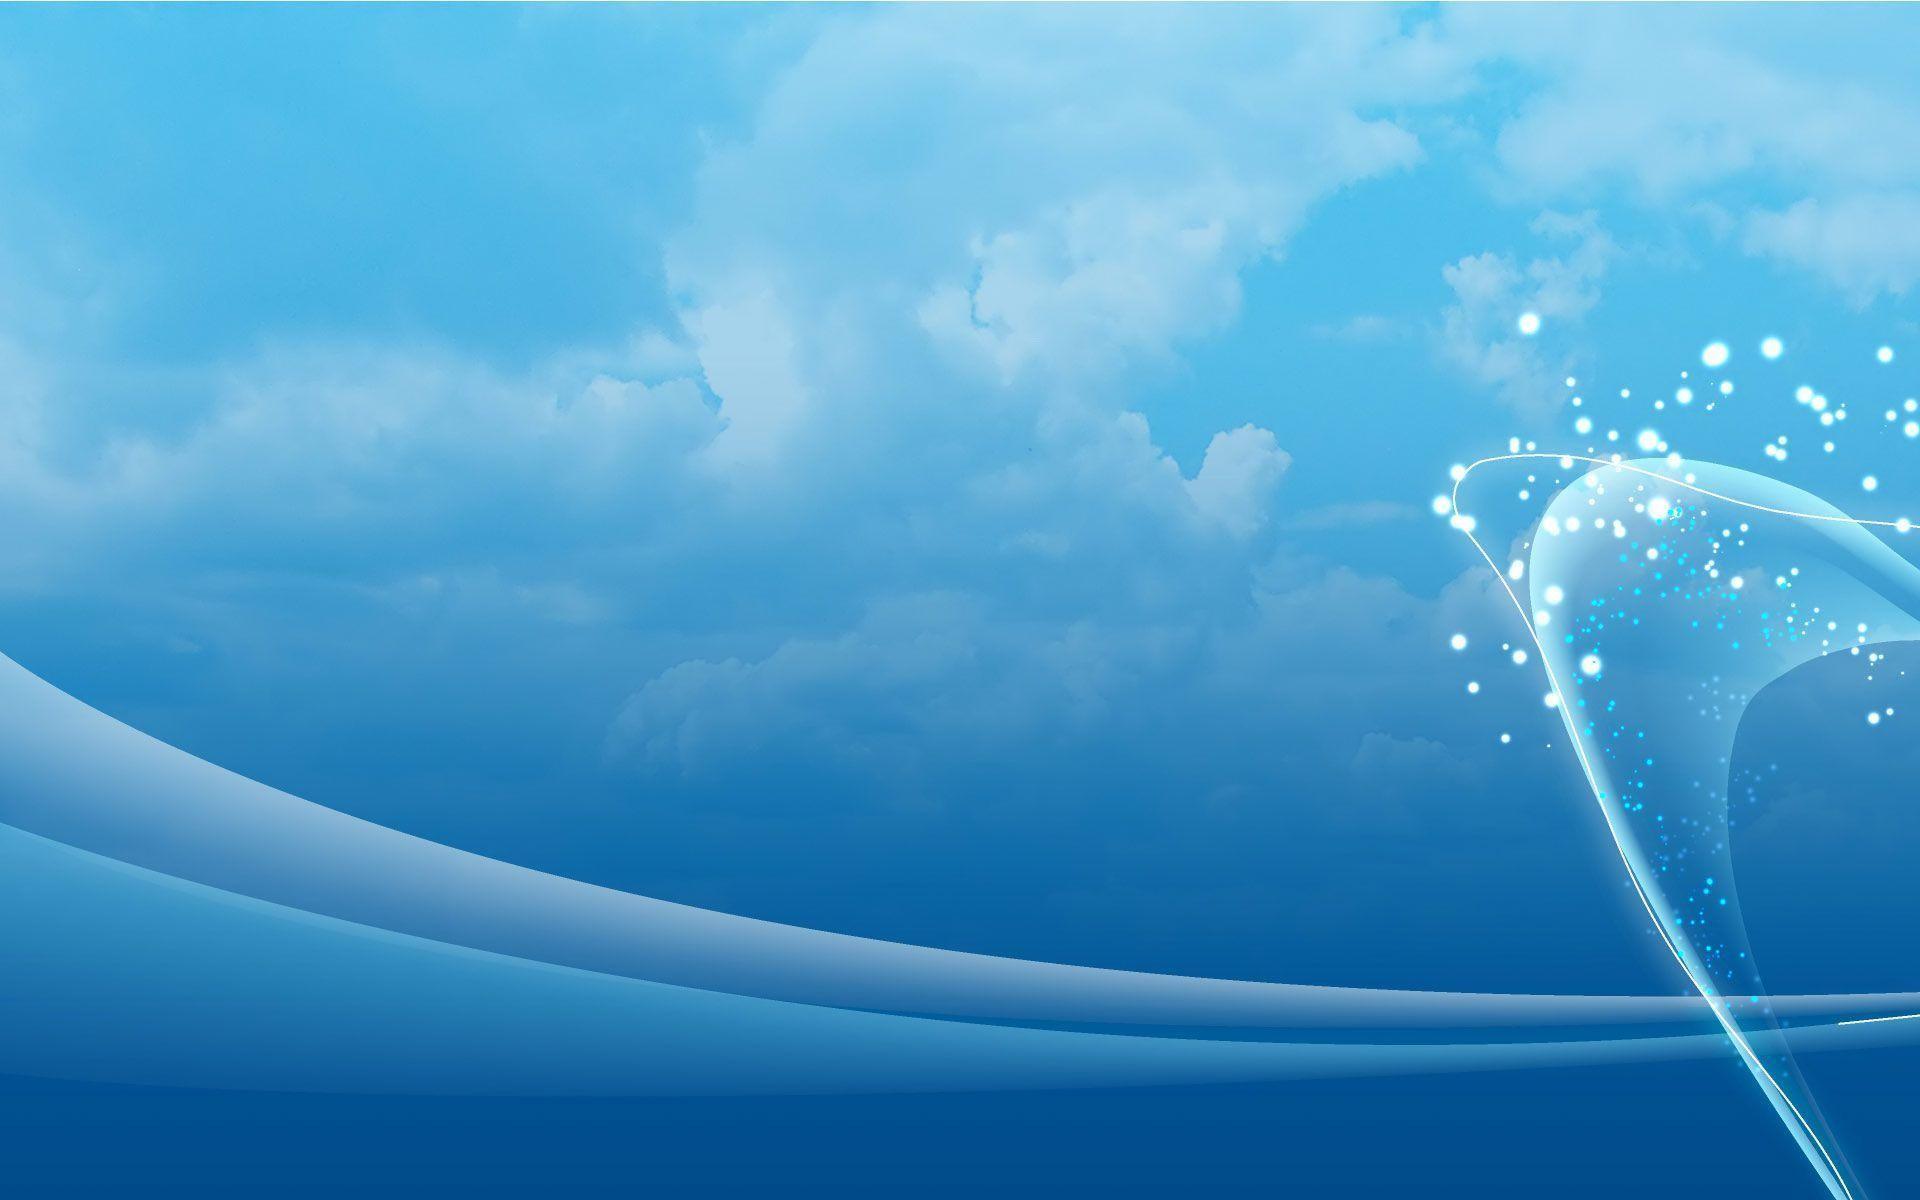 Download Blue Sky Abstrakt Windows Backgrounds Wallpaper | Full HD .